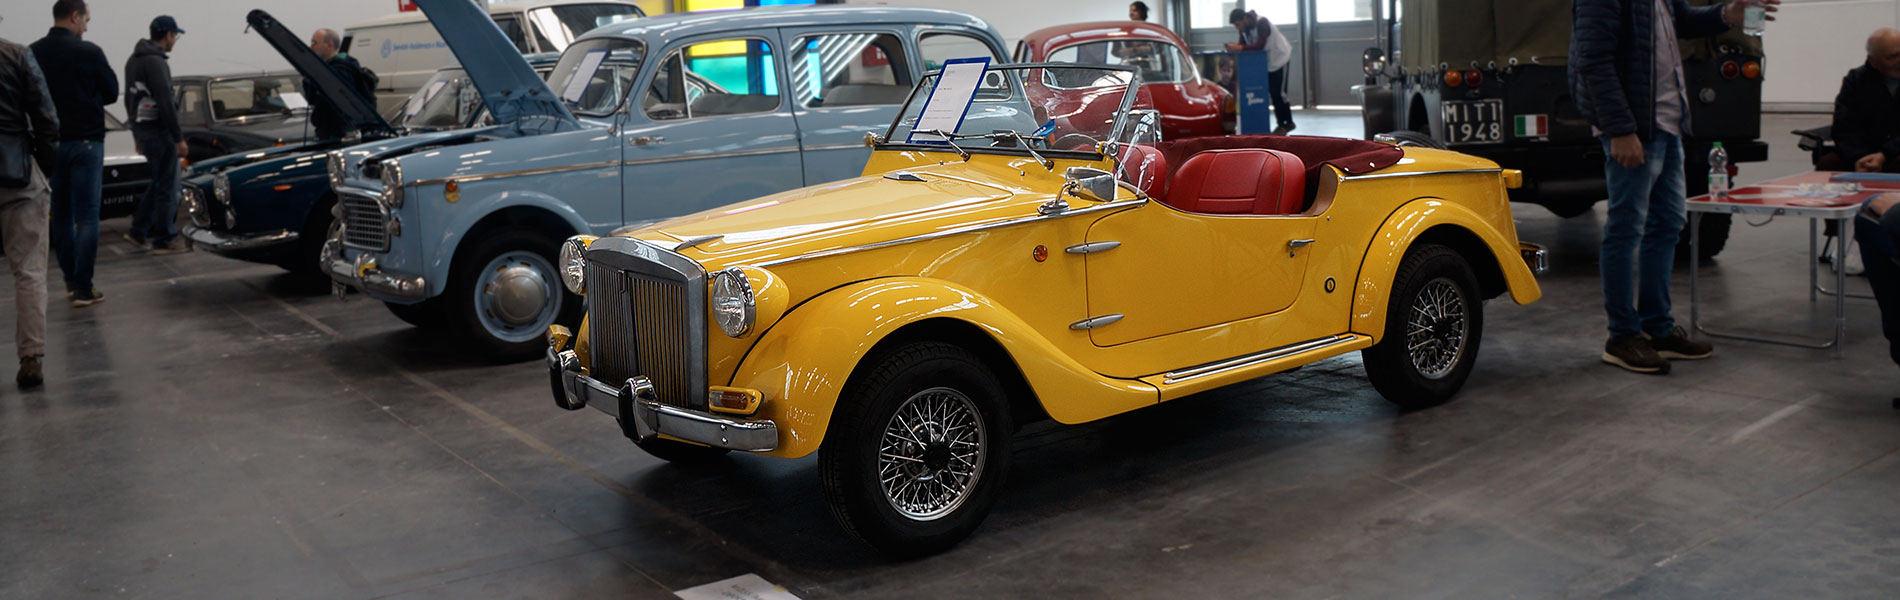 Siata 850 Spring - Anno 1967 - Verona Legend Cars 2019